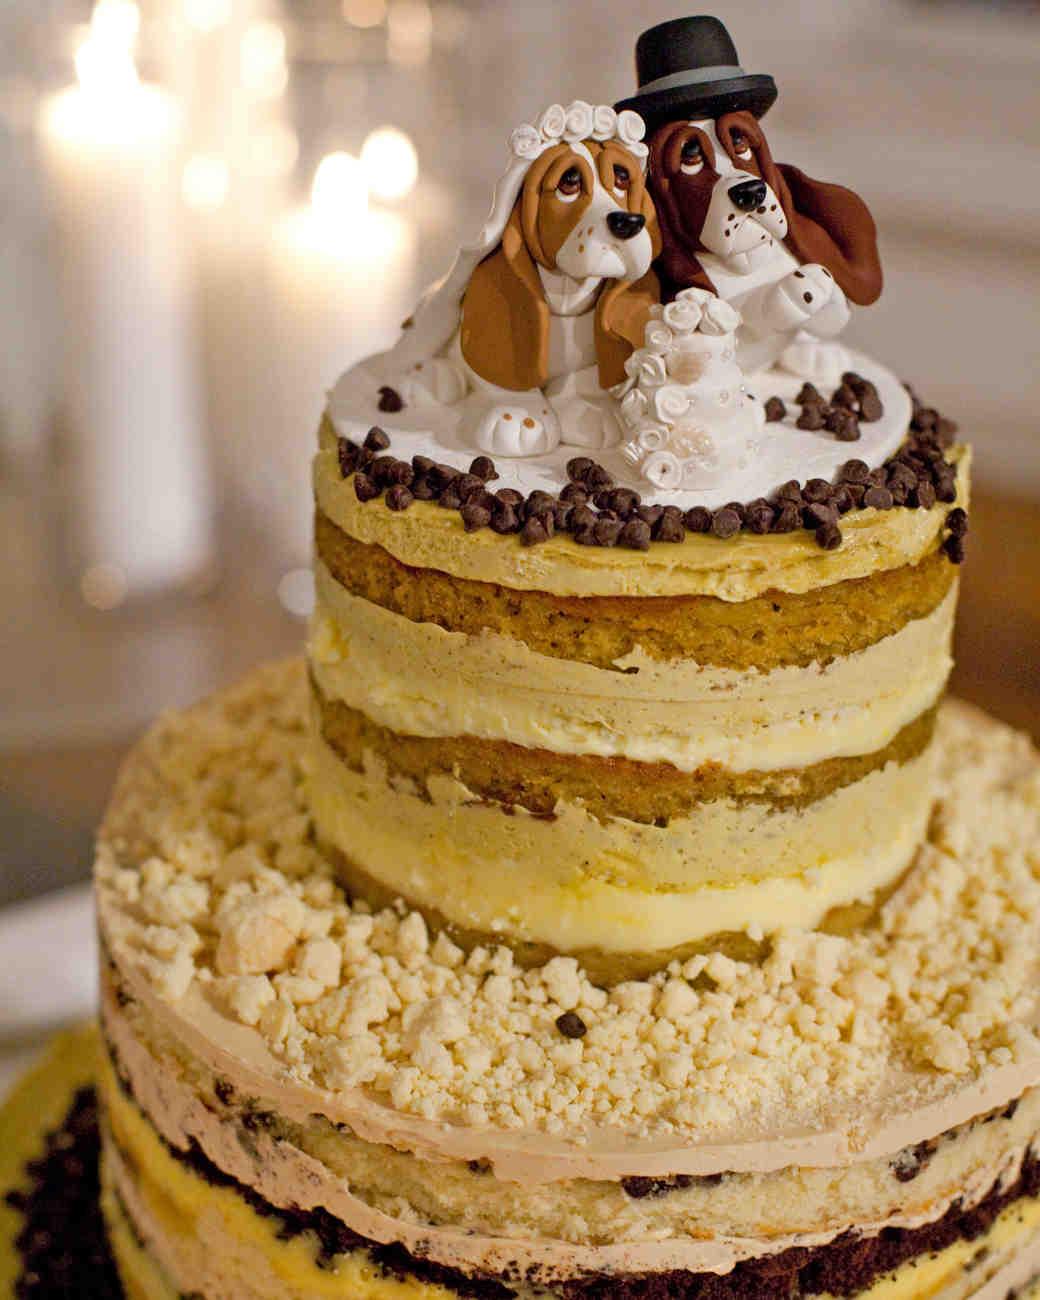 milk-bar-cake-pistachio-choc-chip-0415.jpg